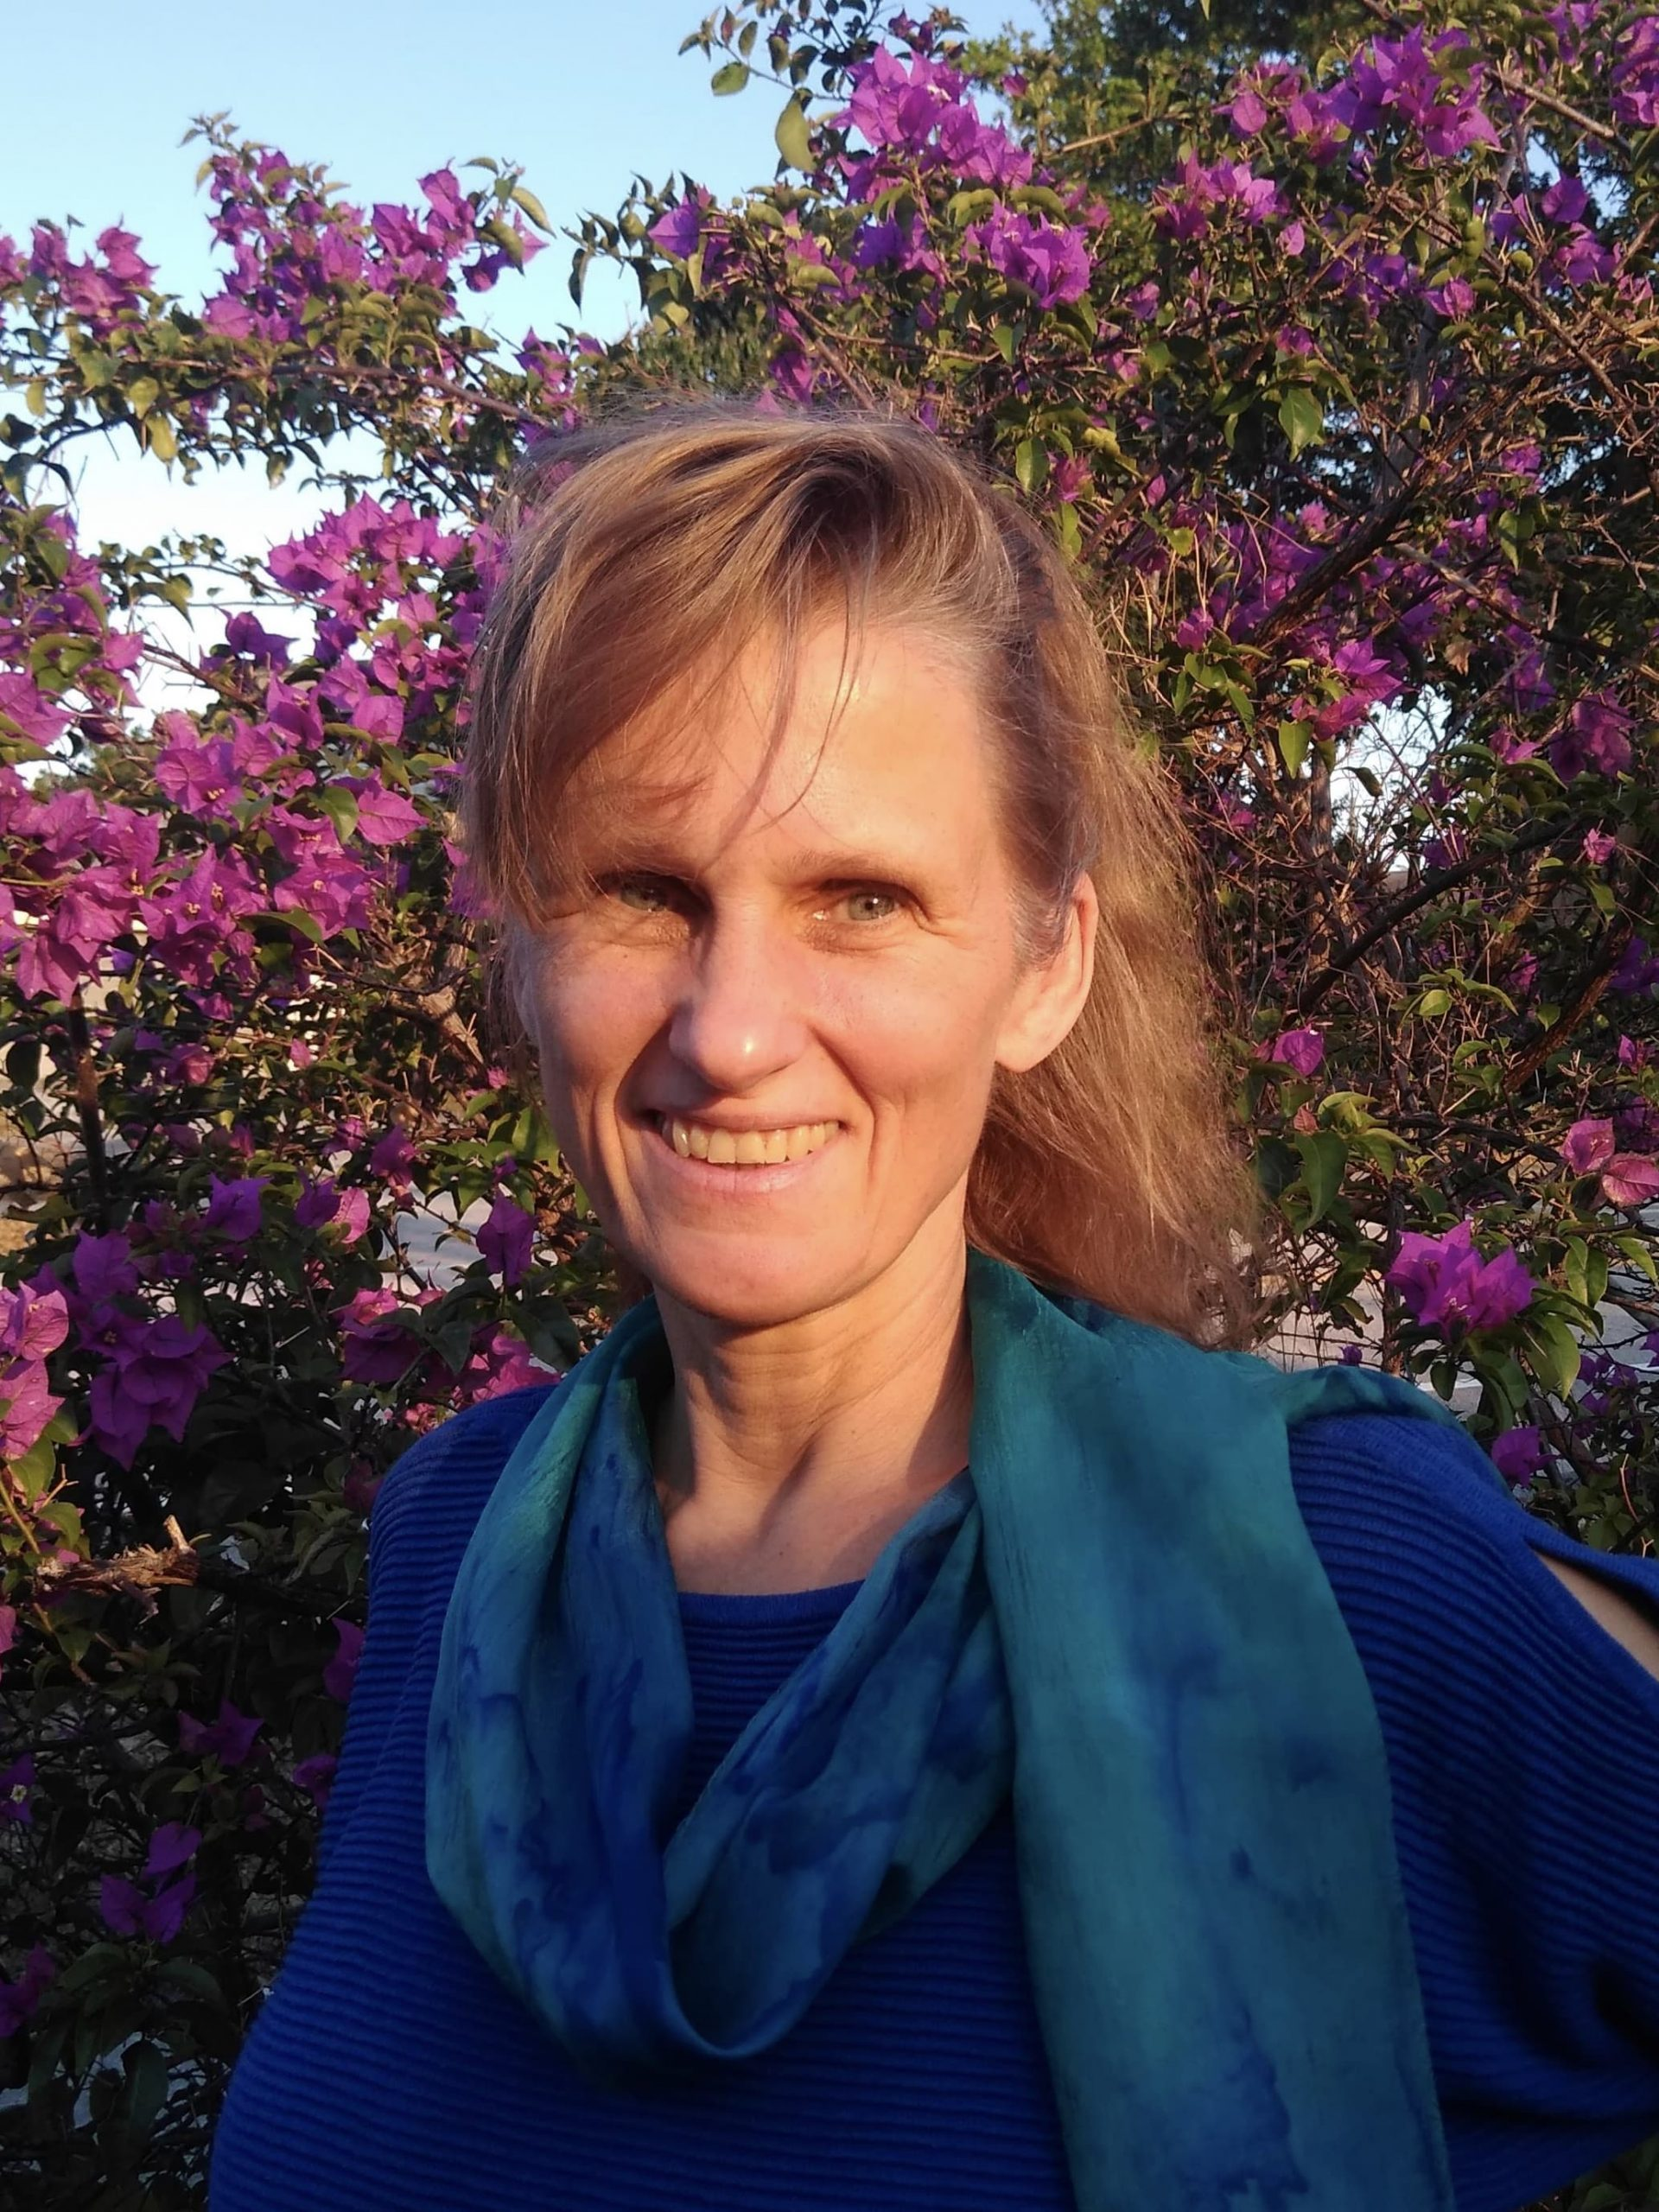 World Class Data Scientist Joins Language I/O Team